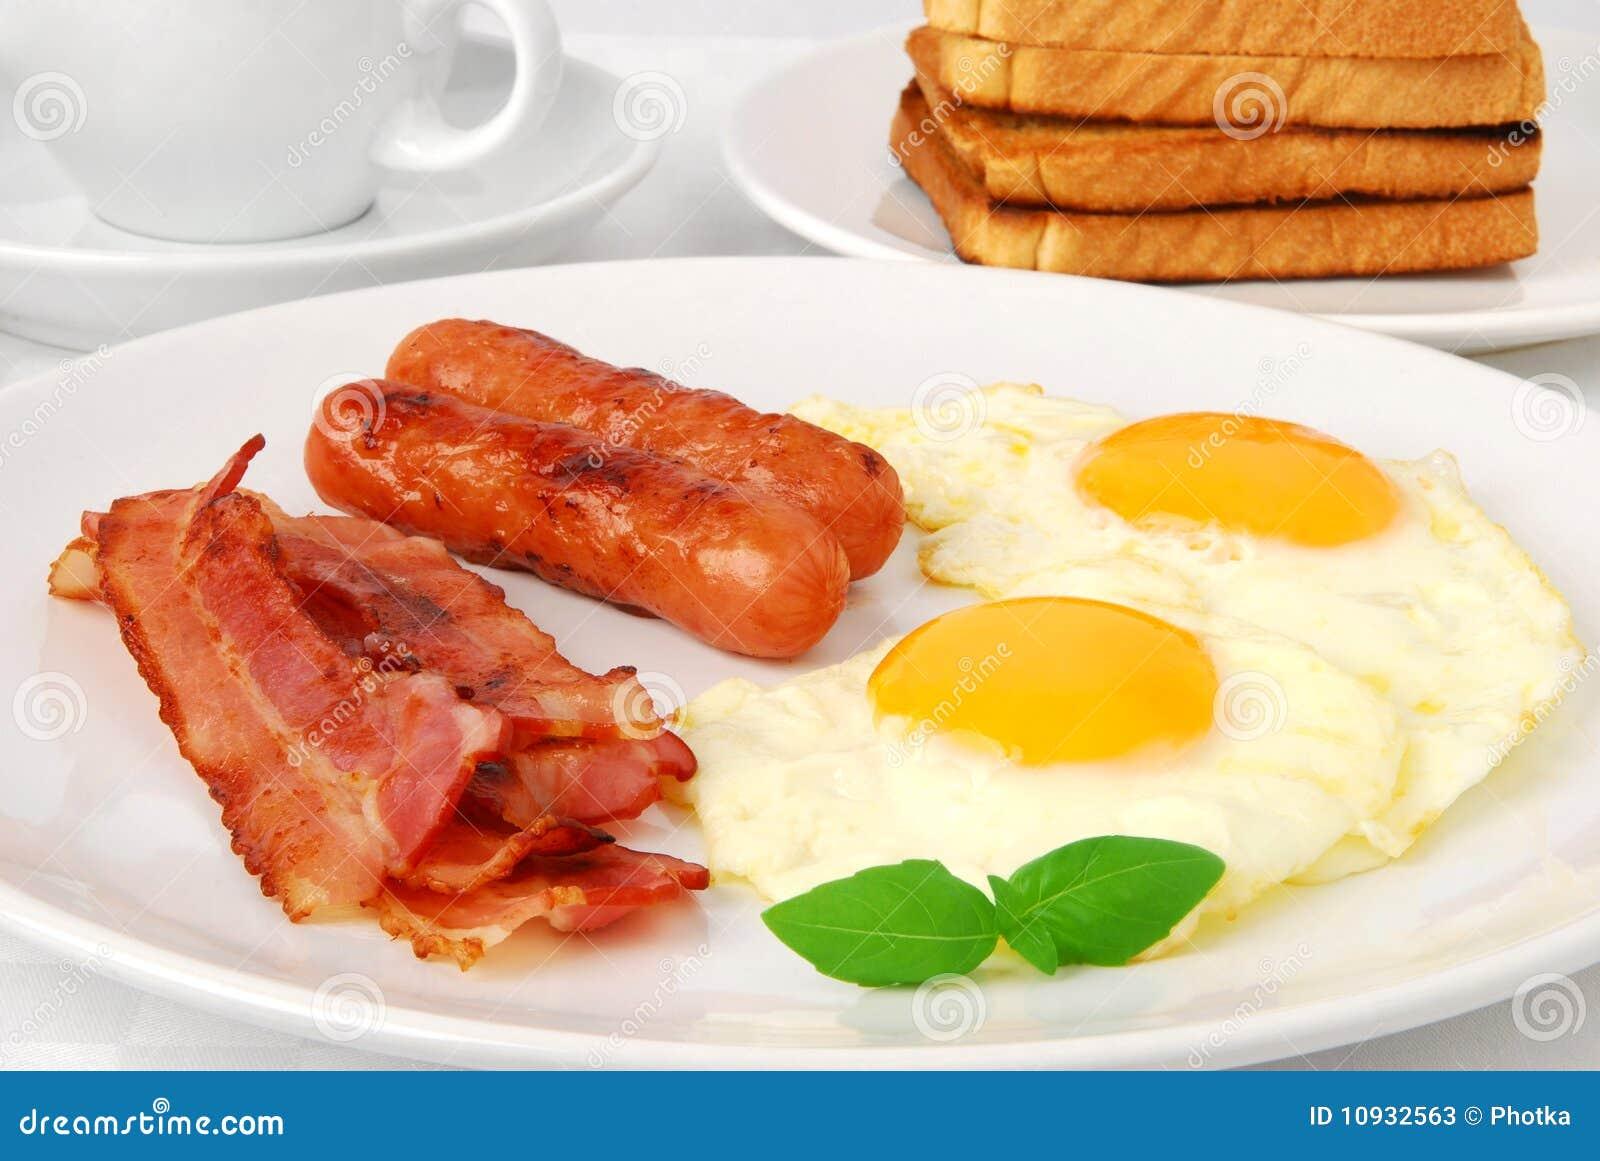 зажаренные яичка завтрака